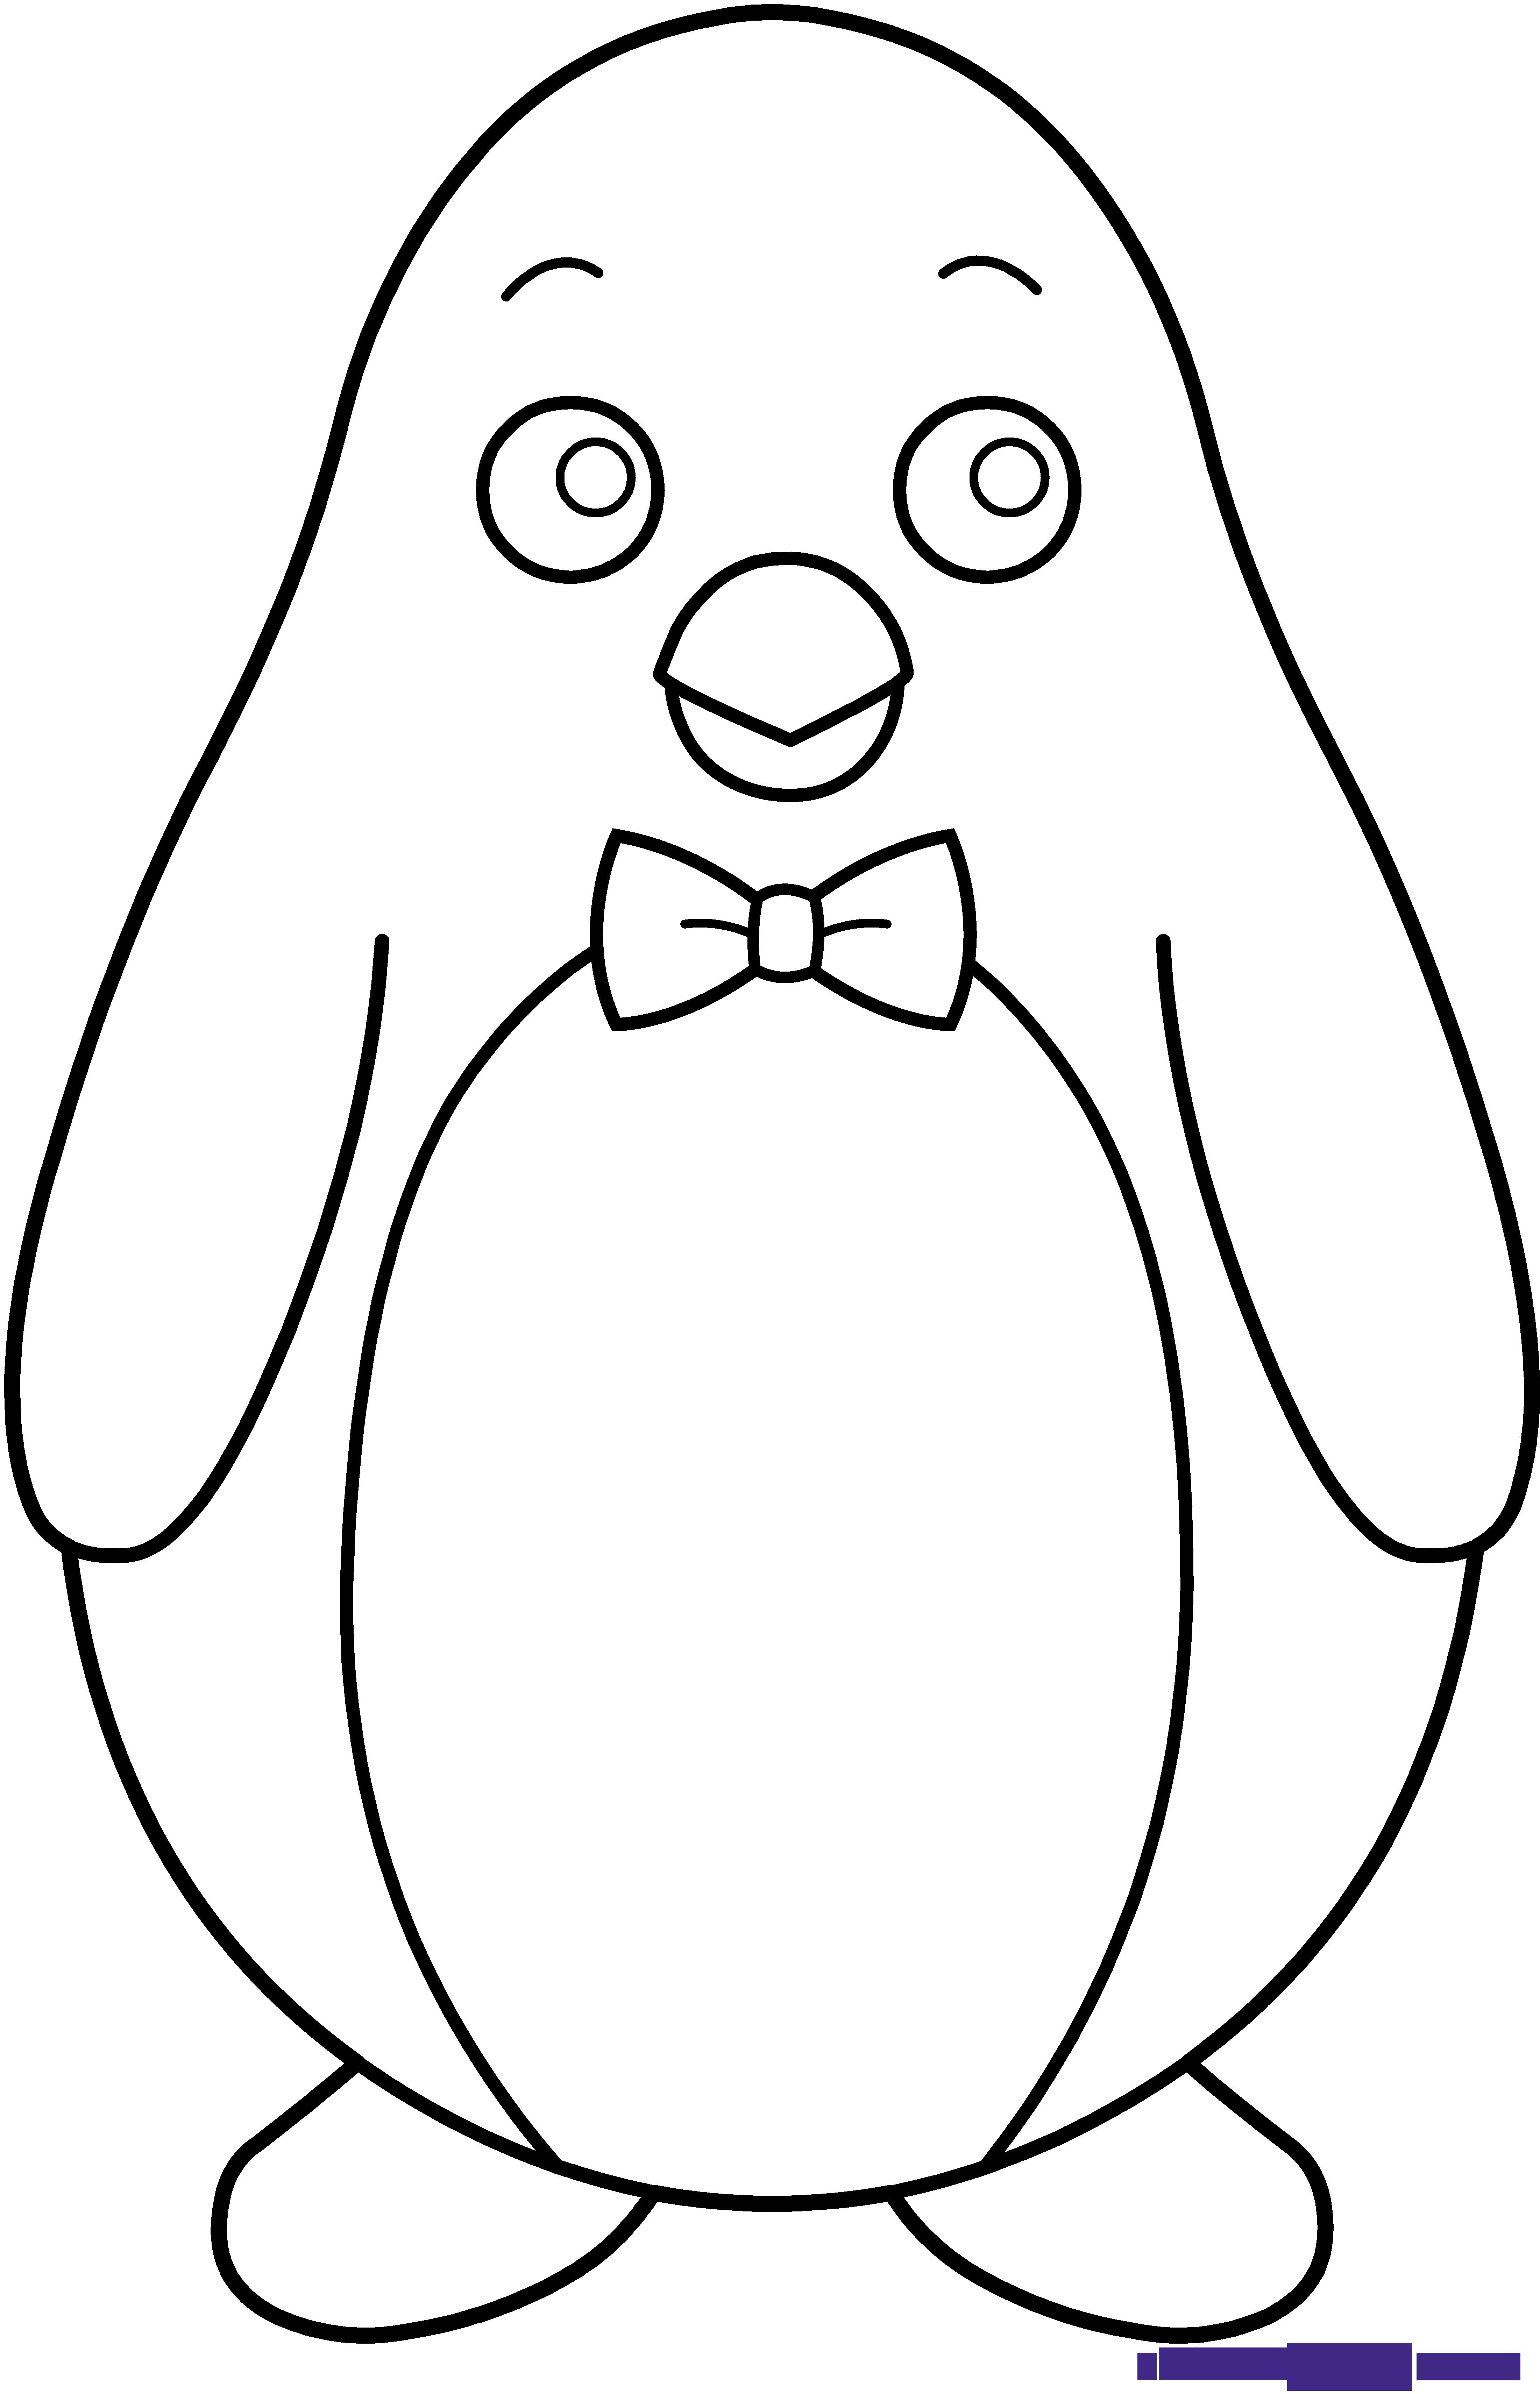 Penguin line art sweet. White clipart bowtie